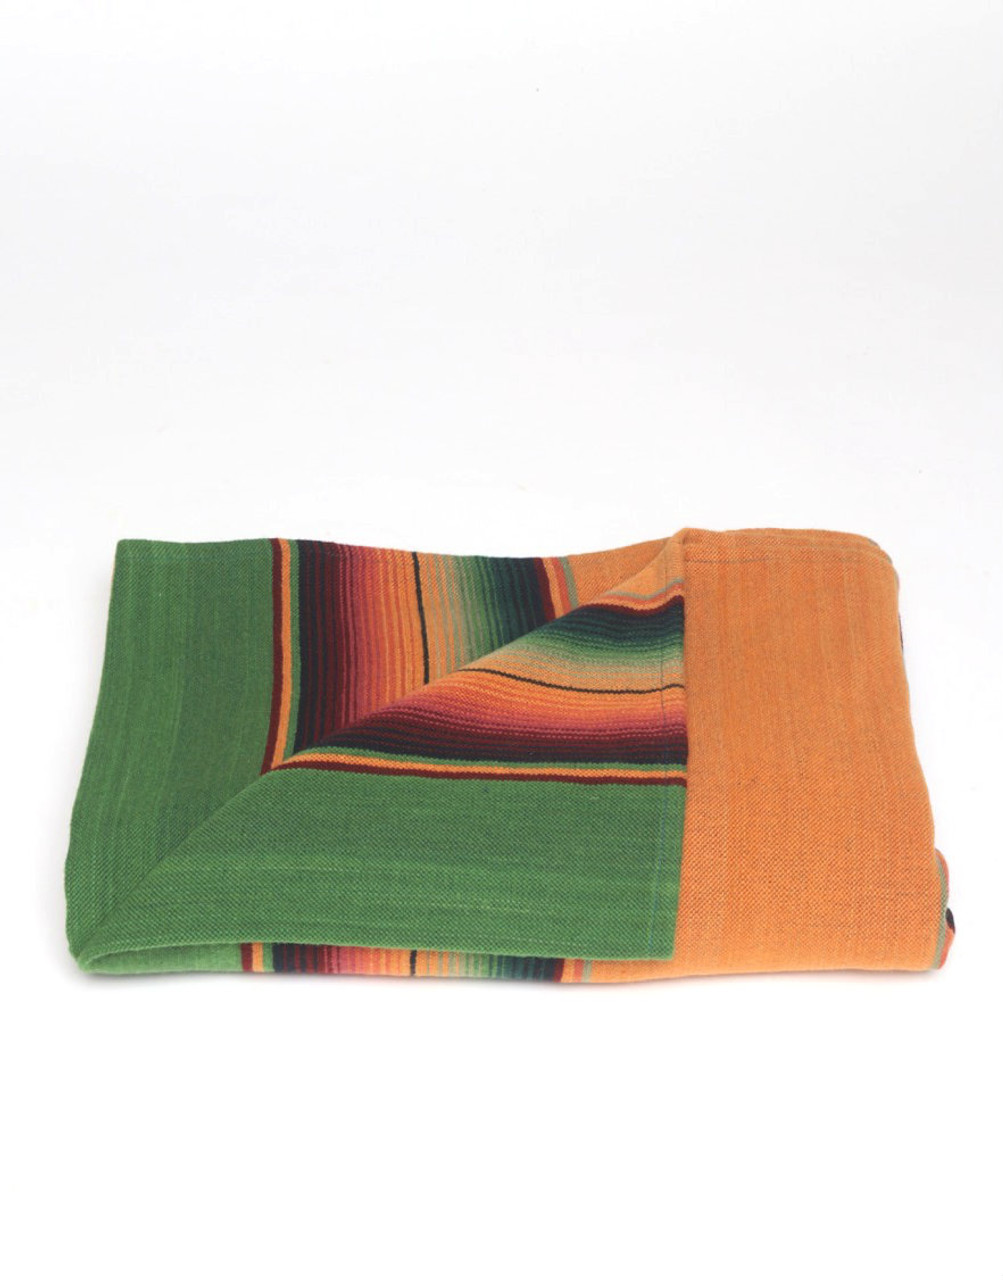 Merino Wool Serape Blanket Mexicano - pre-order